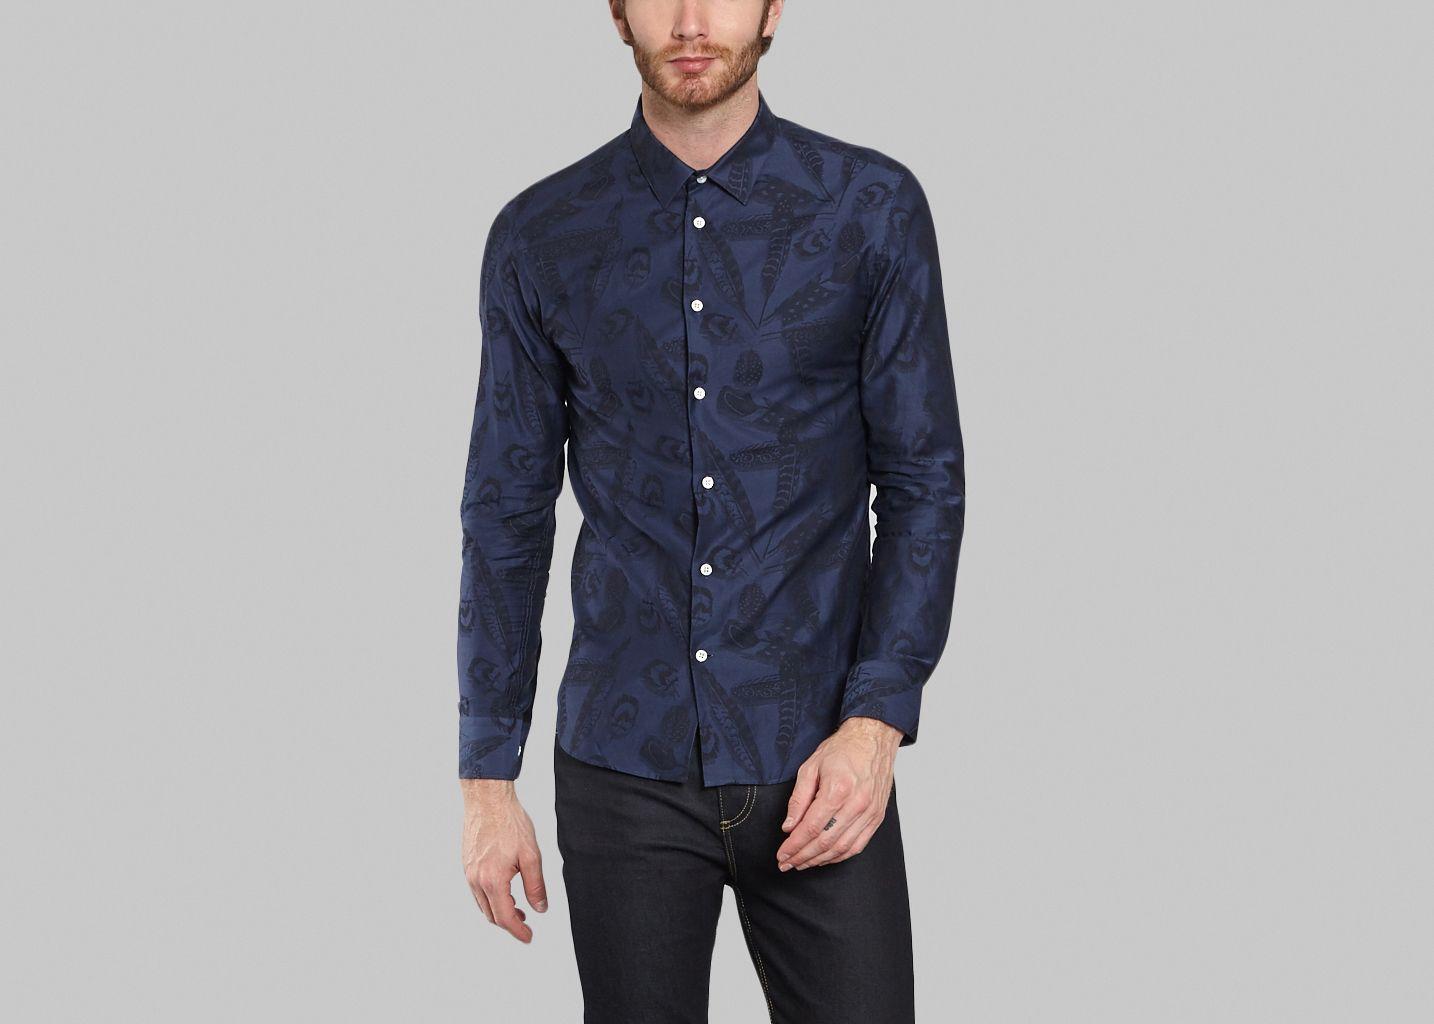 chemise tam sange paul joe bleu marine l 39 exception. Black Bedroom Furniture Sets. Home Design Ideas